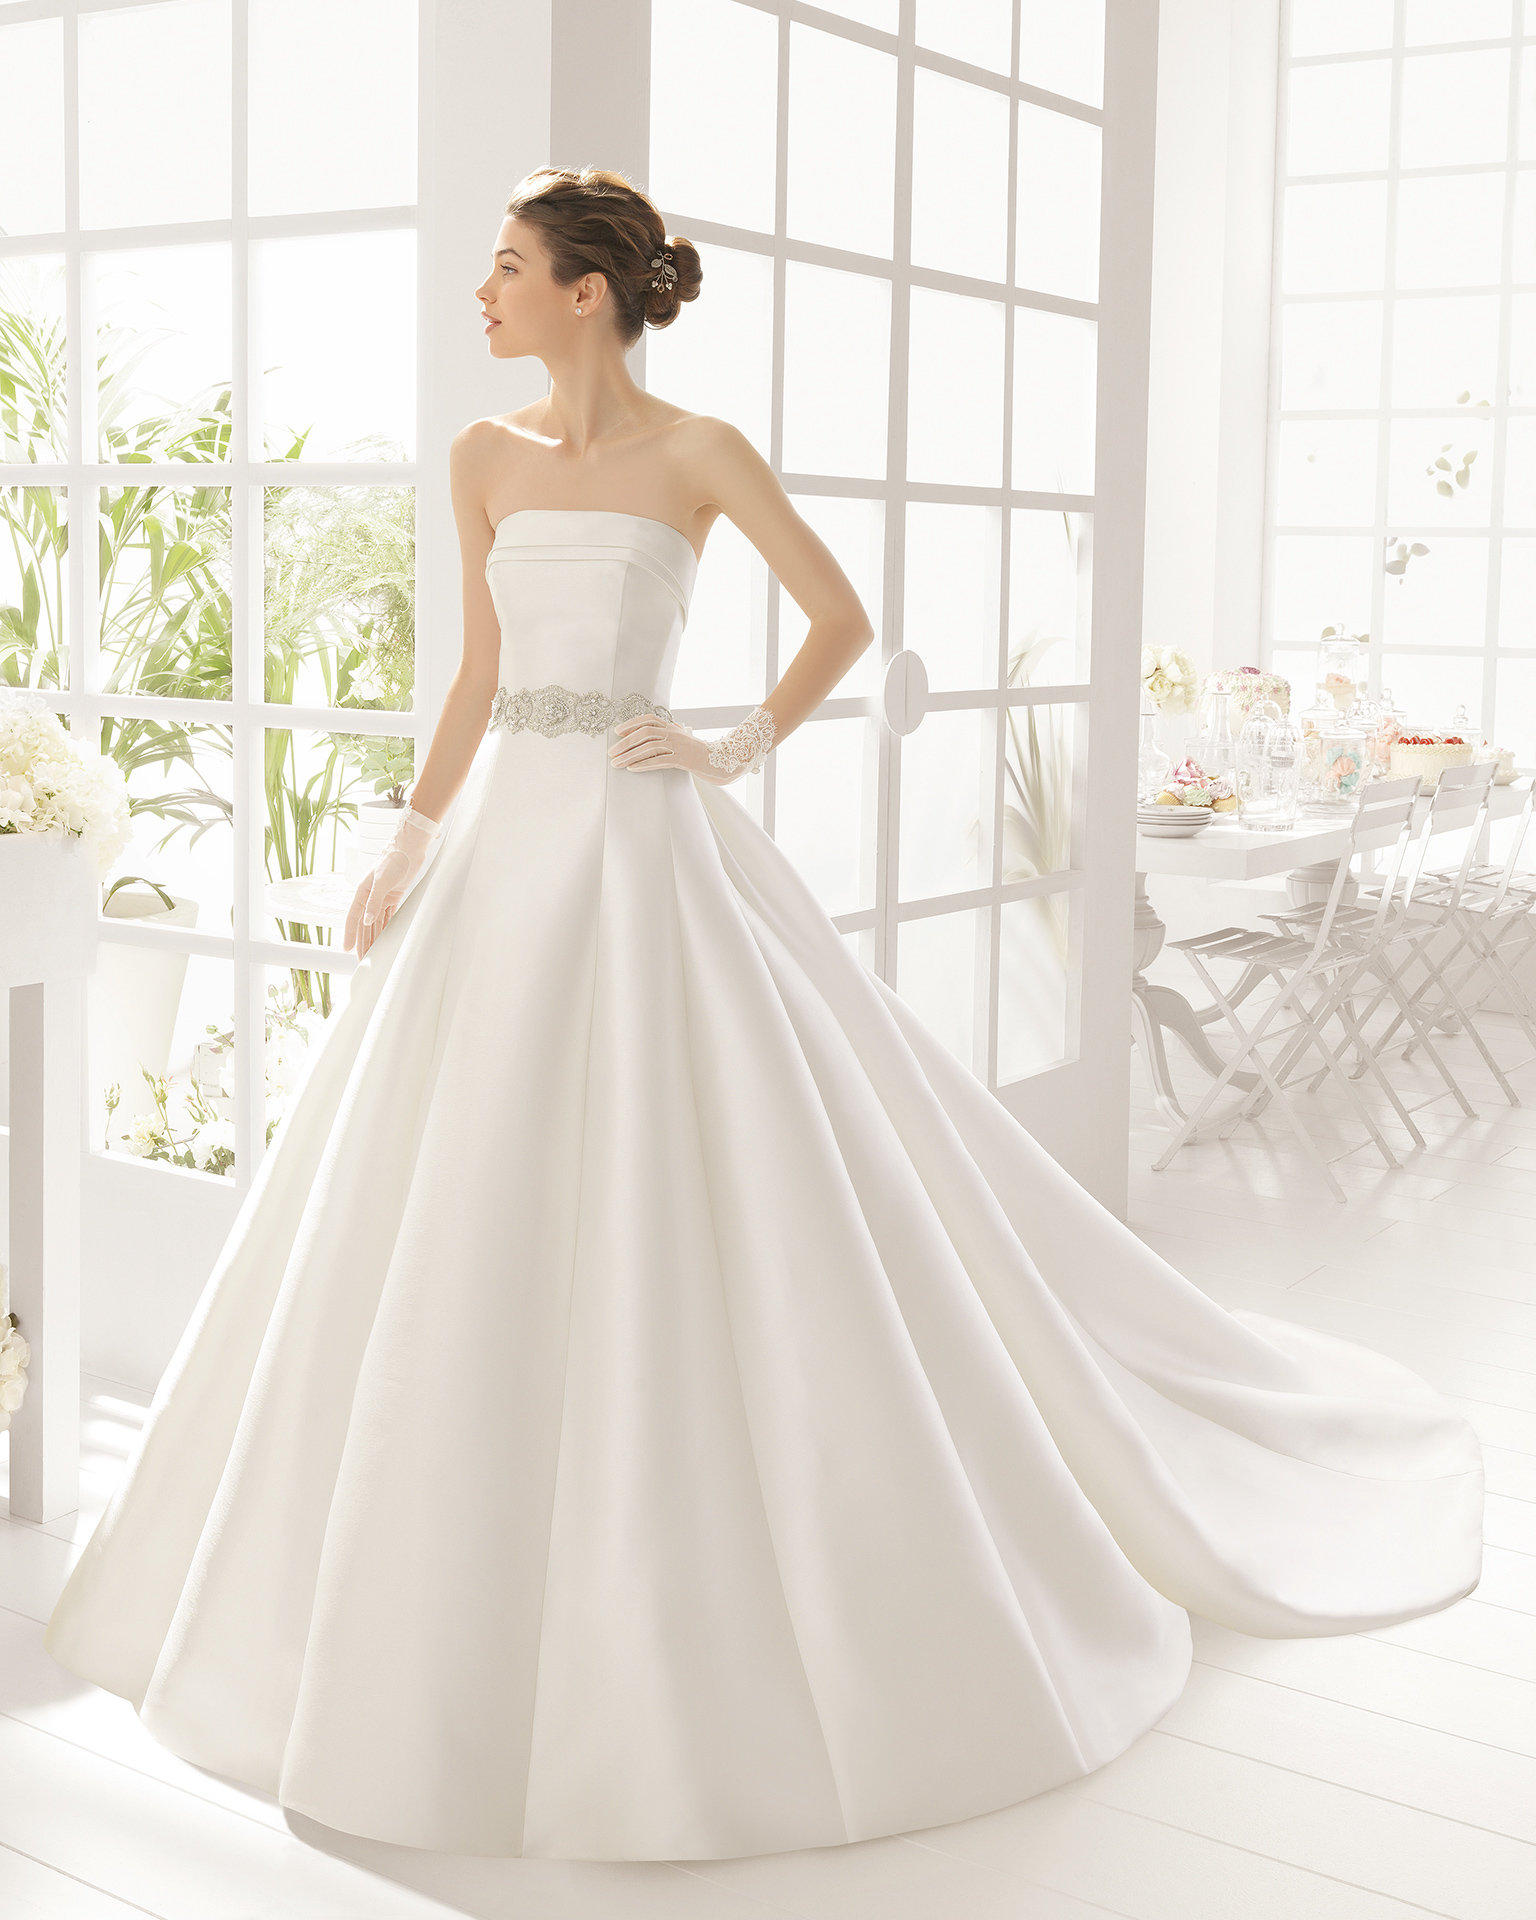 MERLIN wedding dress - Aire Barcelona 2016.